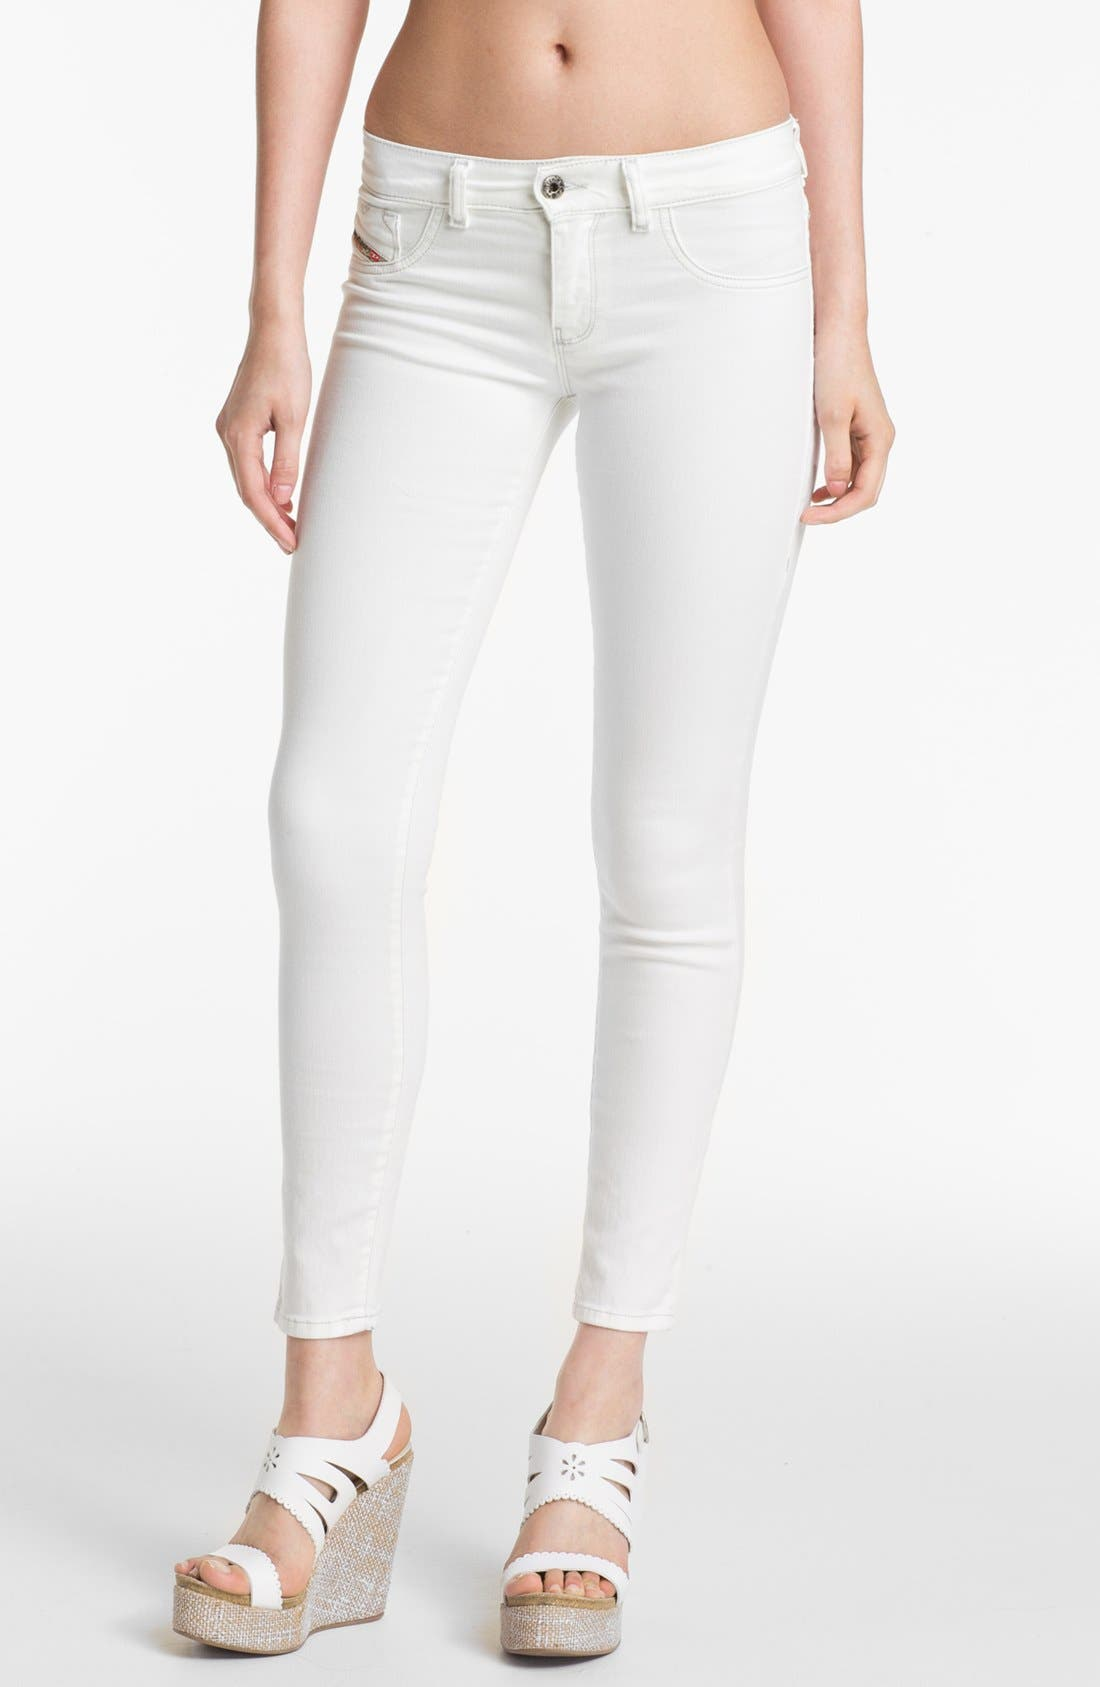 Alternate Image 1 Selected - DIESEL® 'Livier' Ankle Skinny Jeans (White)